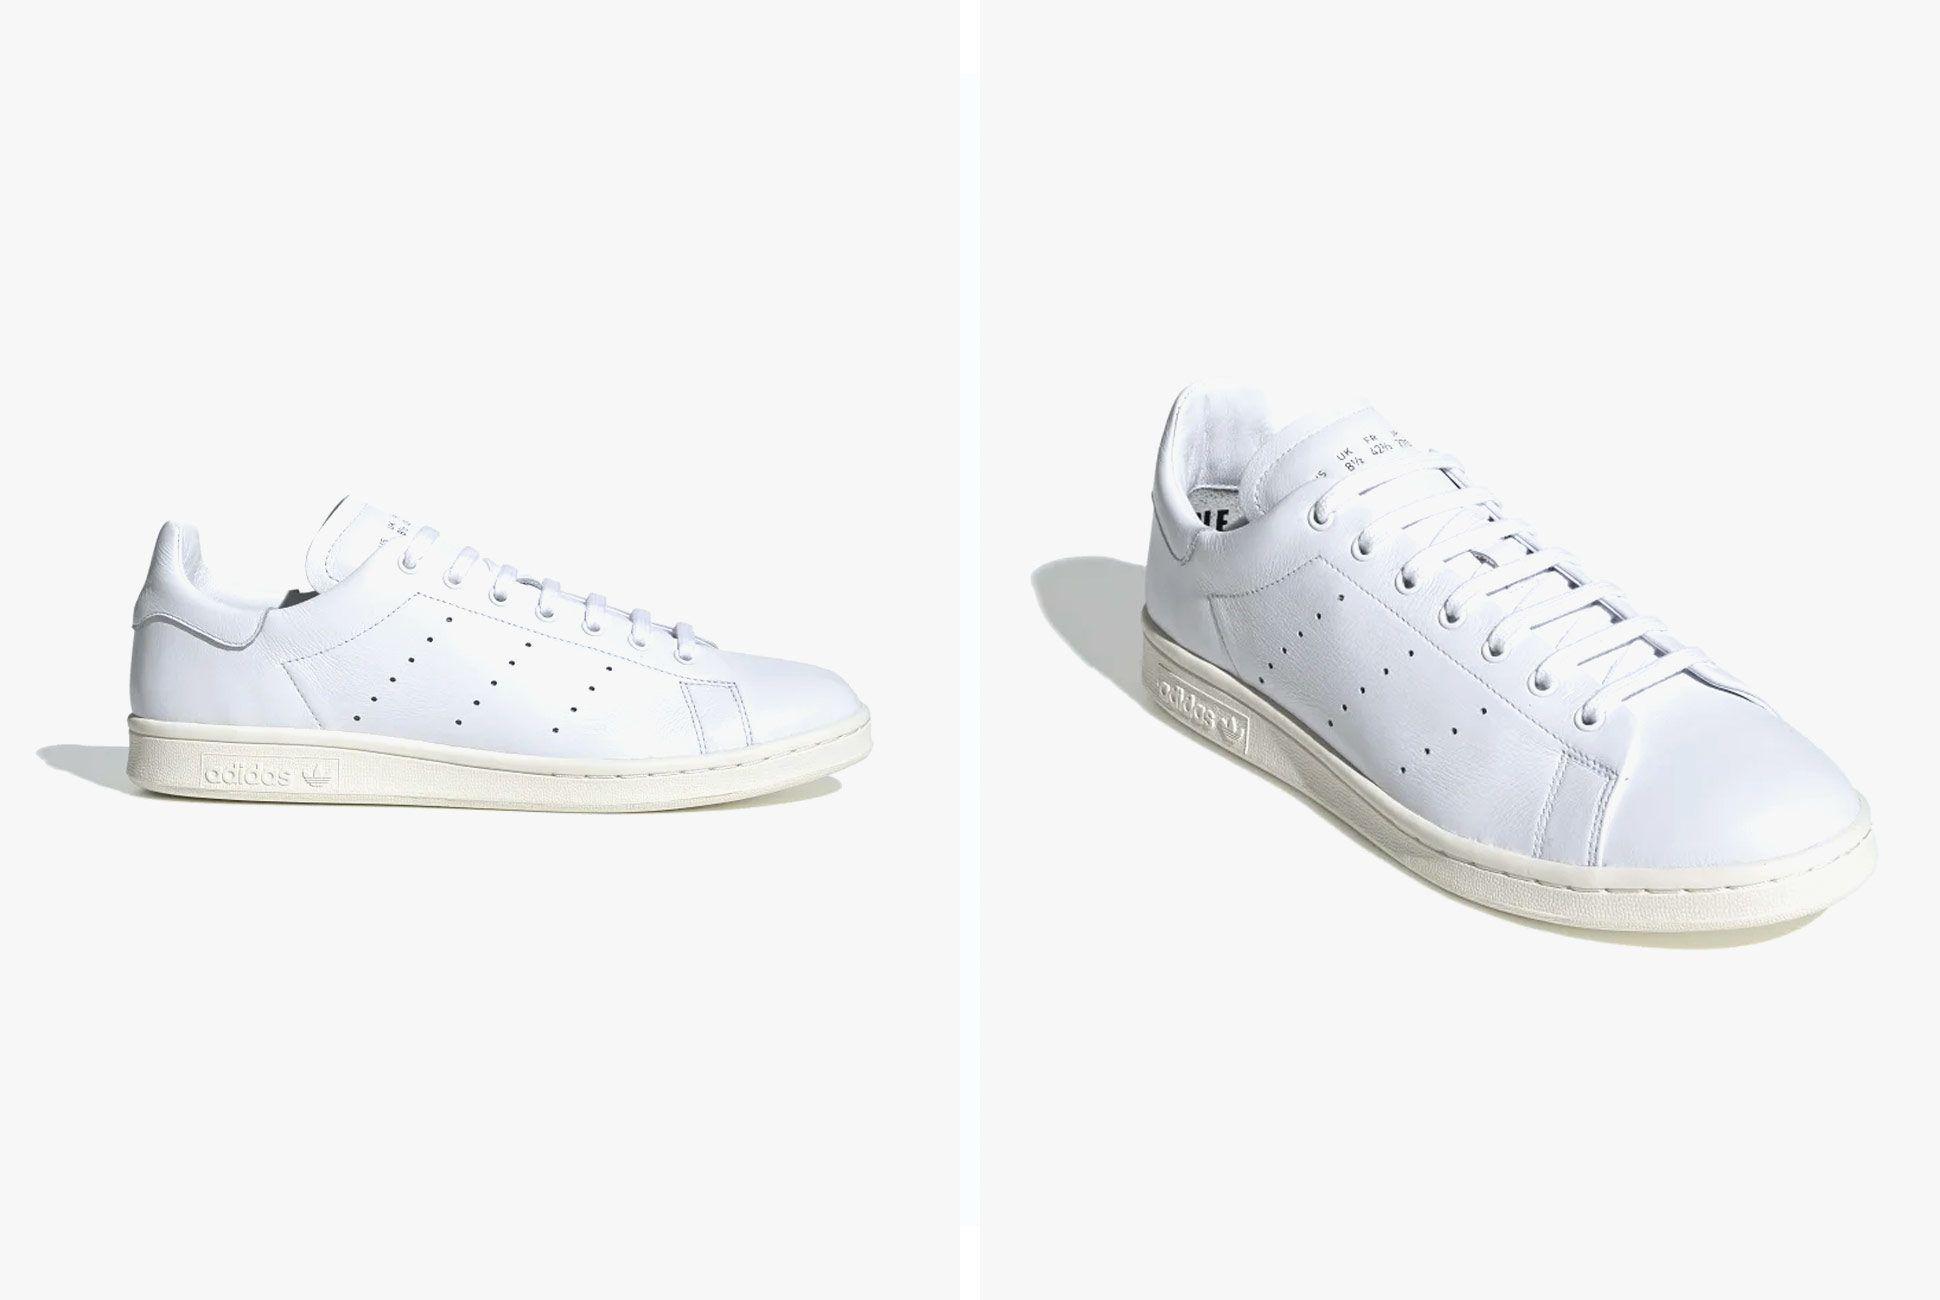 Adidas-Classics-Collection-gear-patrol-slide-1